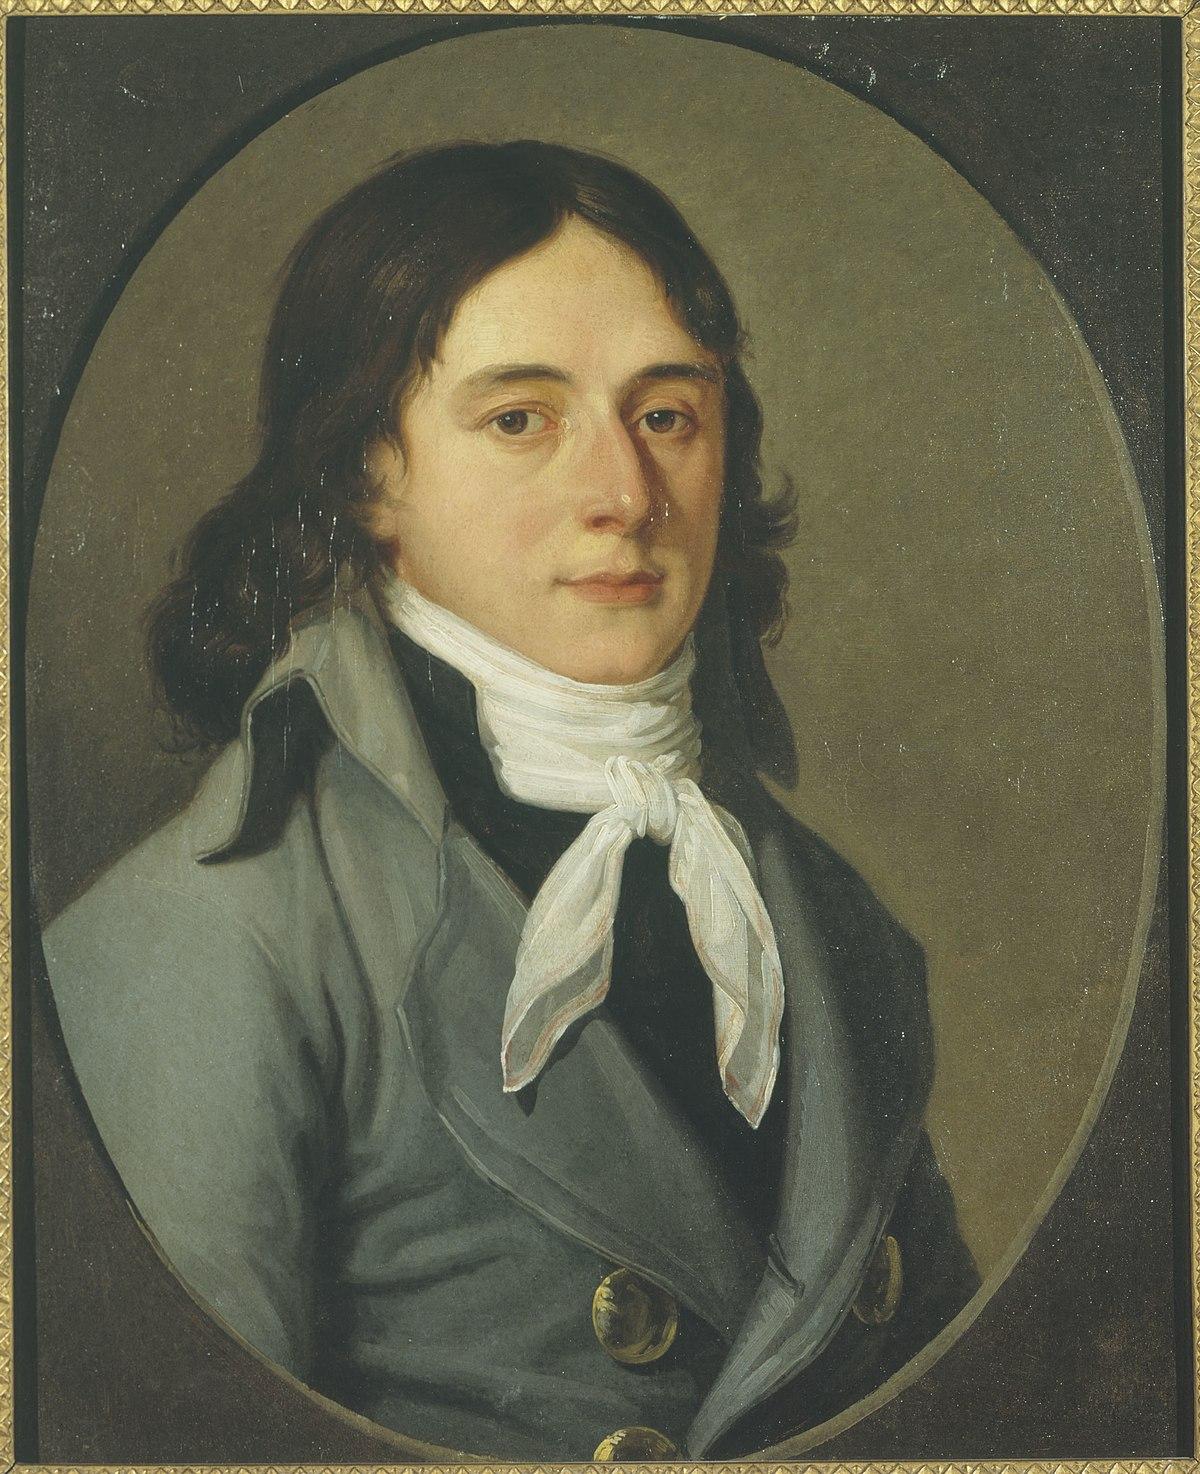 Camille Desmoulins - Wikipedia